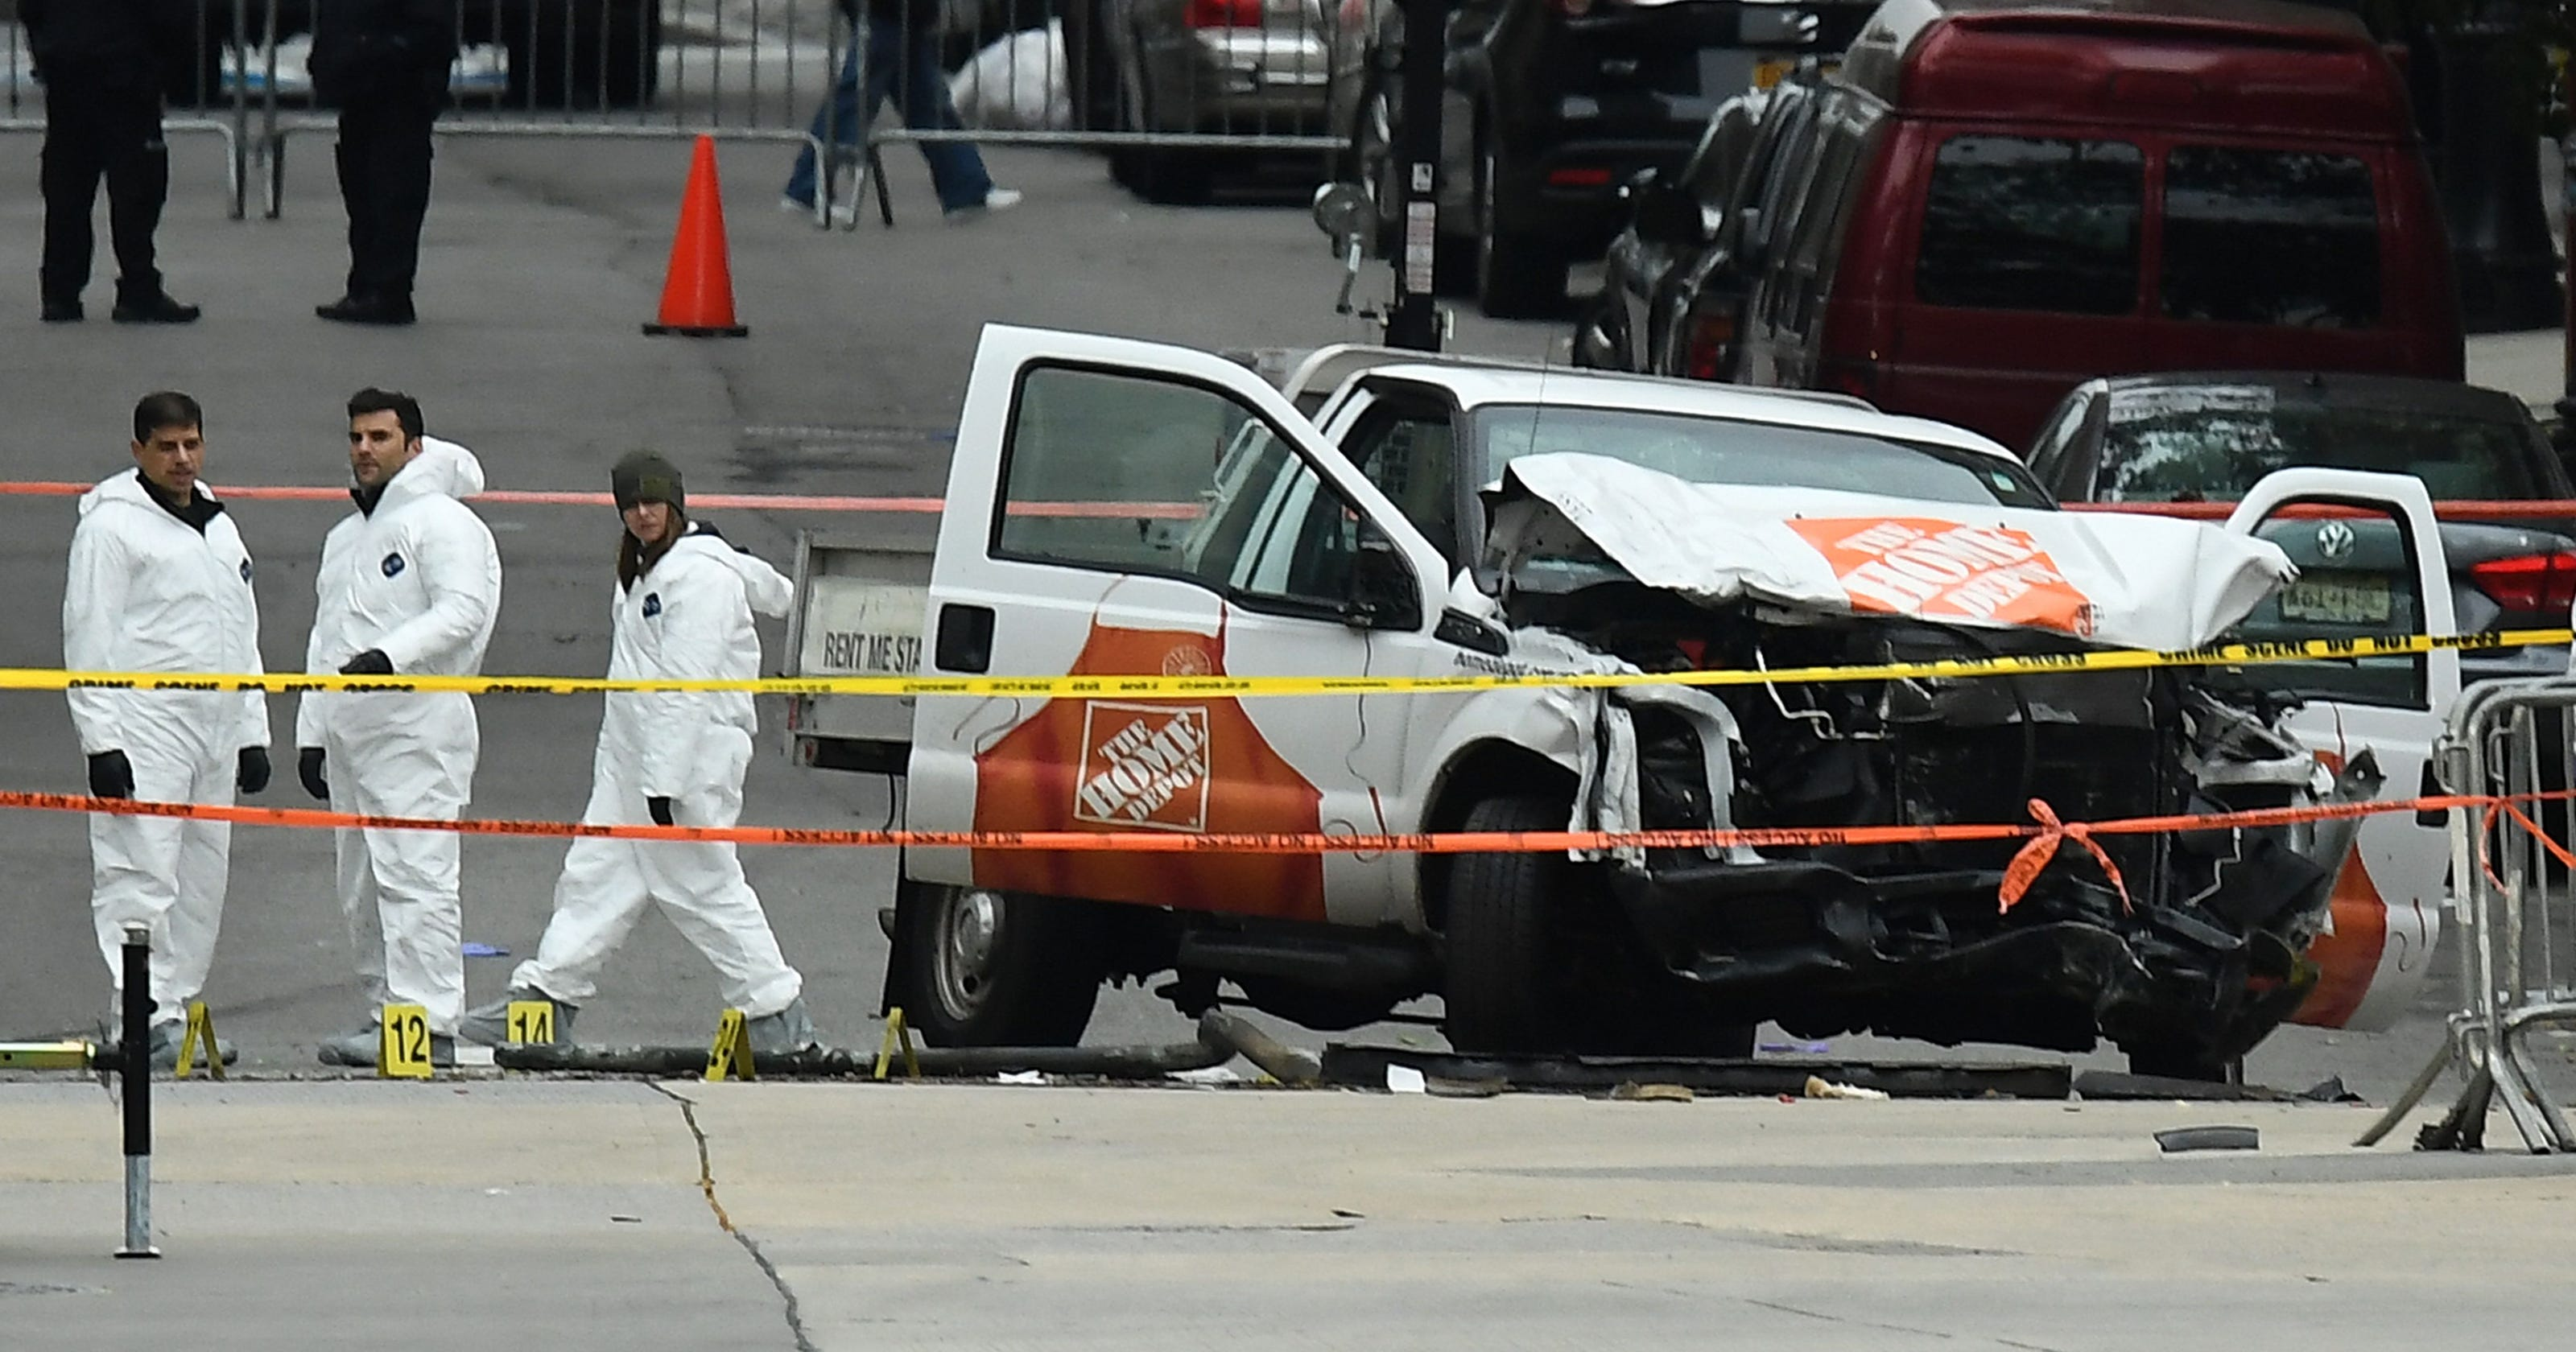 Sayfullo Saipov, NYC terror suspect, drove for Uber